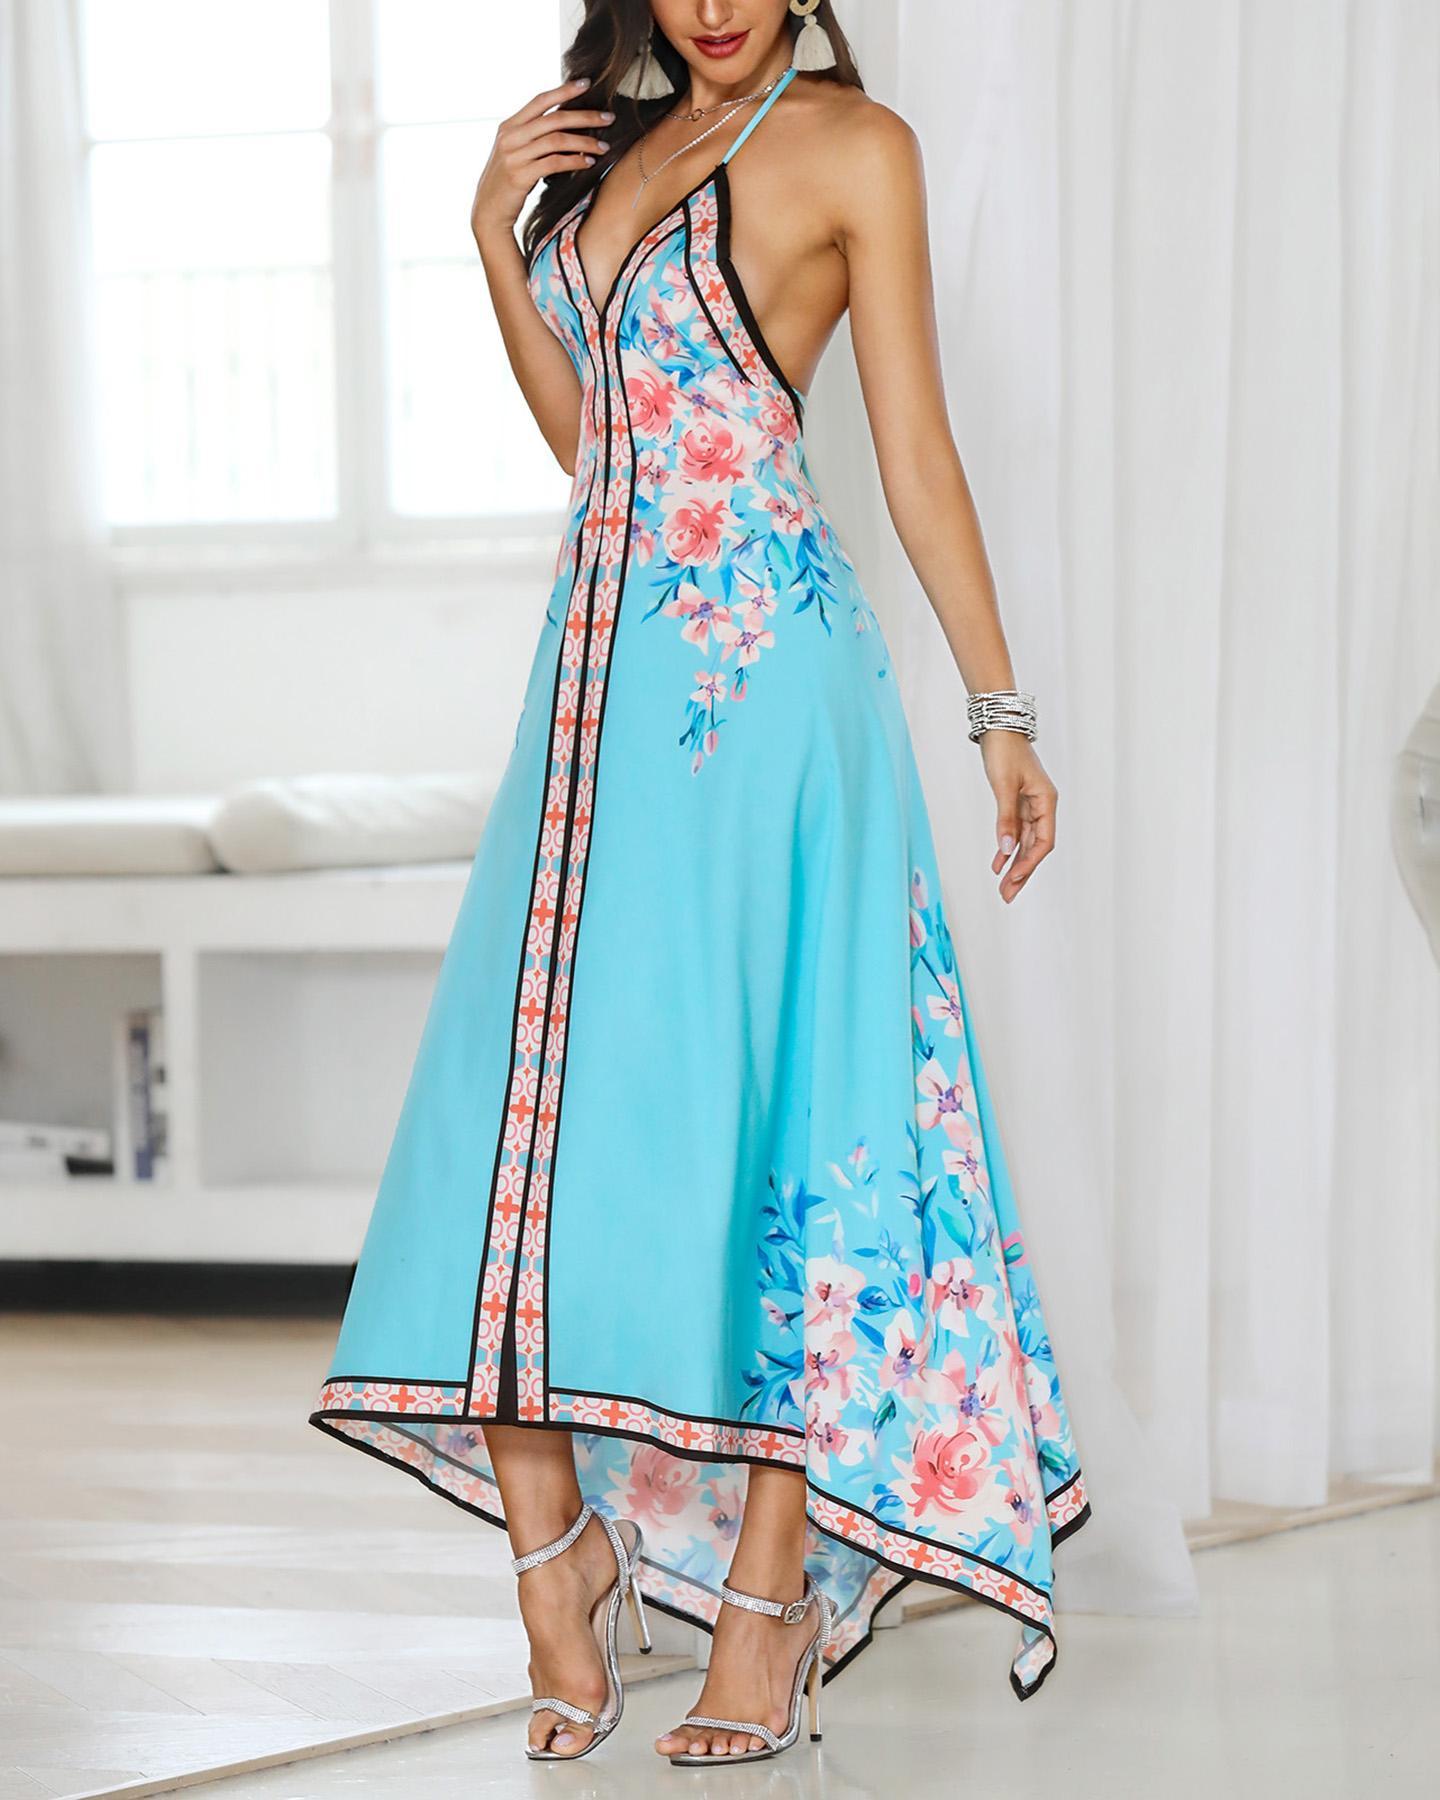 Floral Print Halter Backless Irregular Maxi Dress